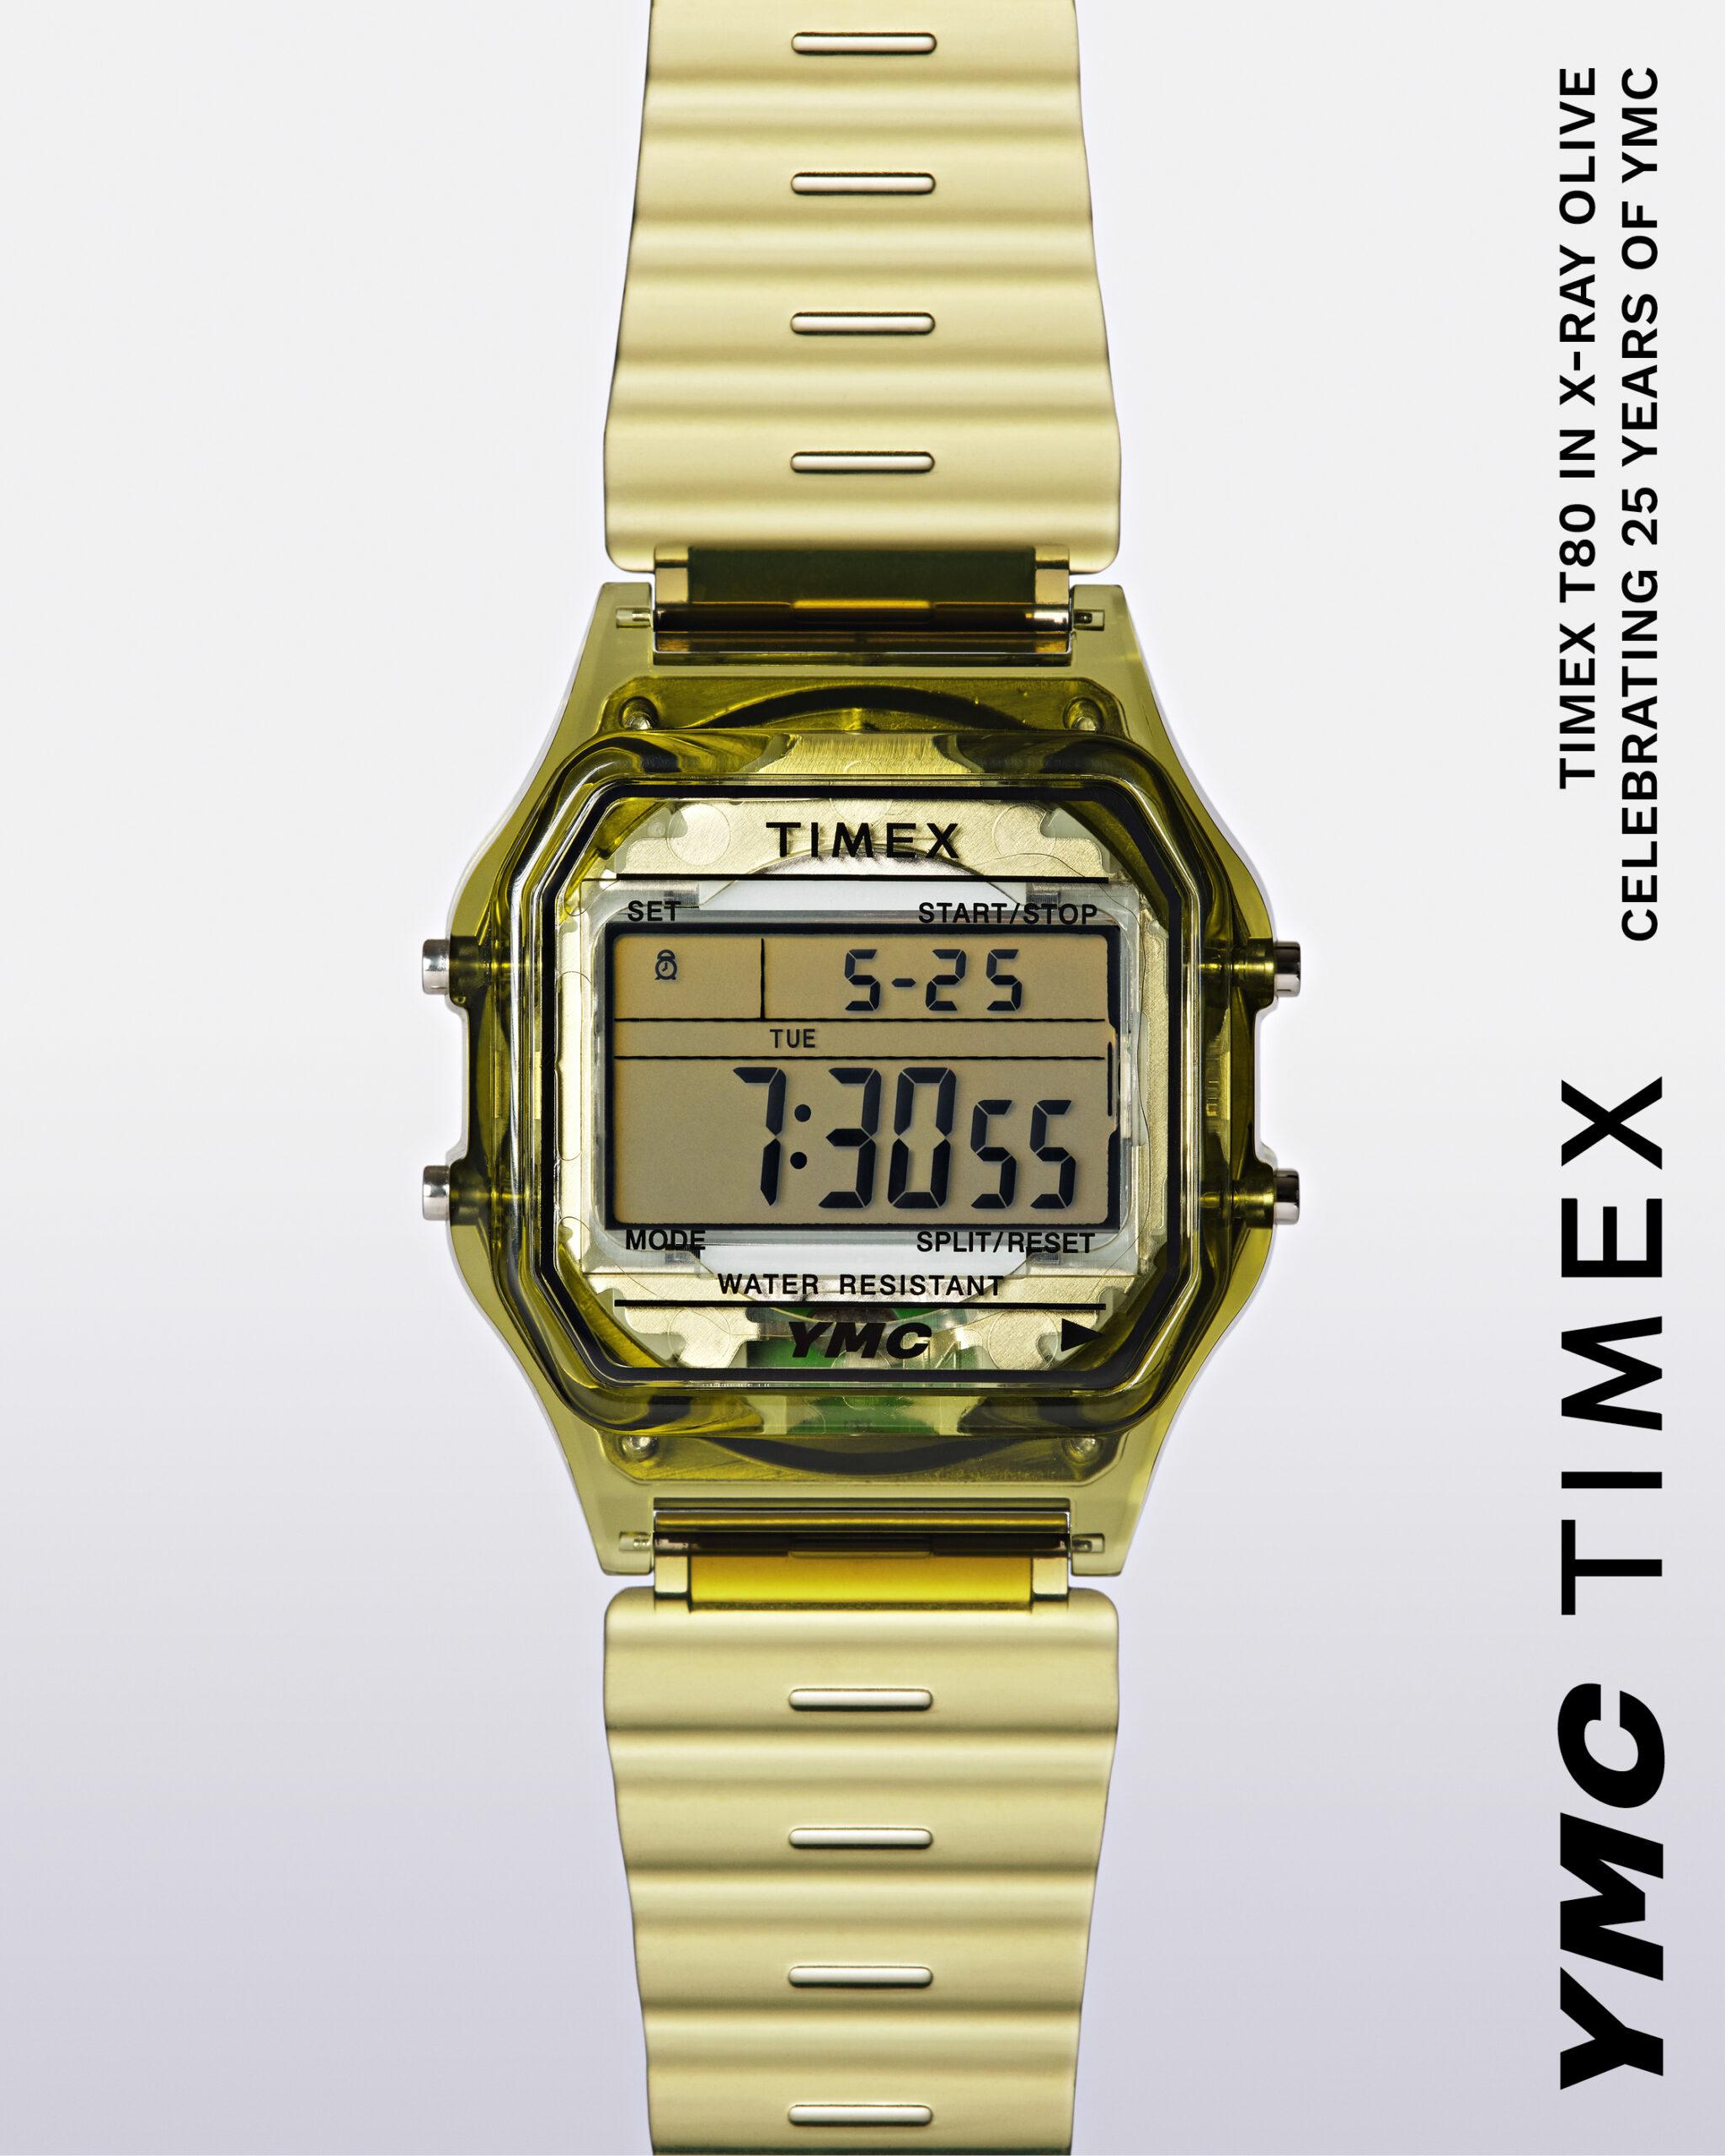 Timex YMC Gold watch